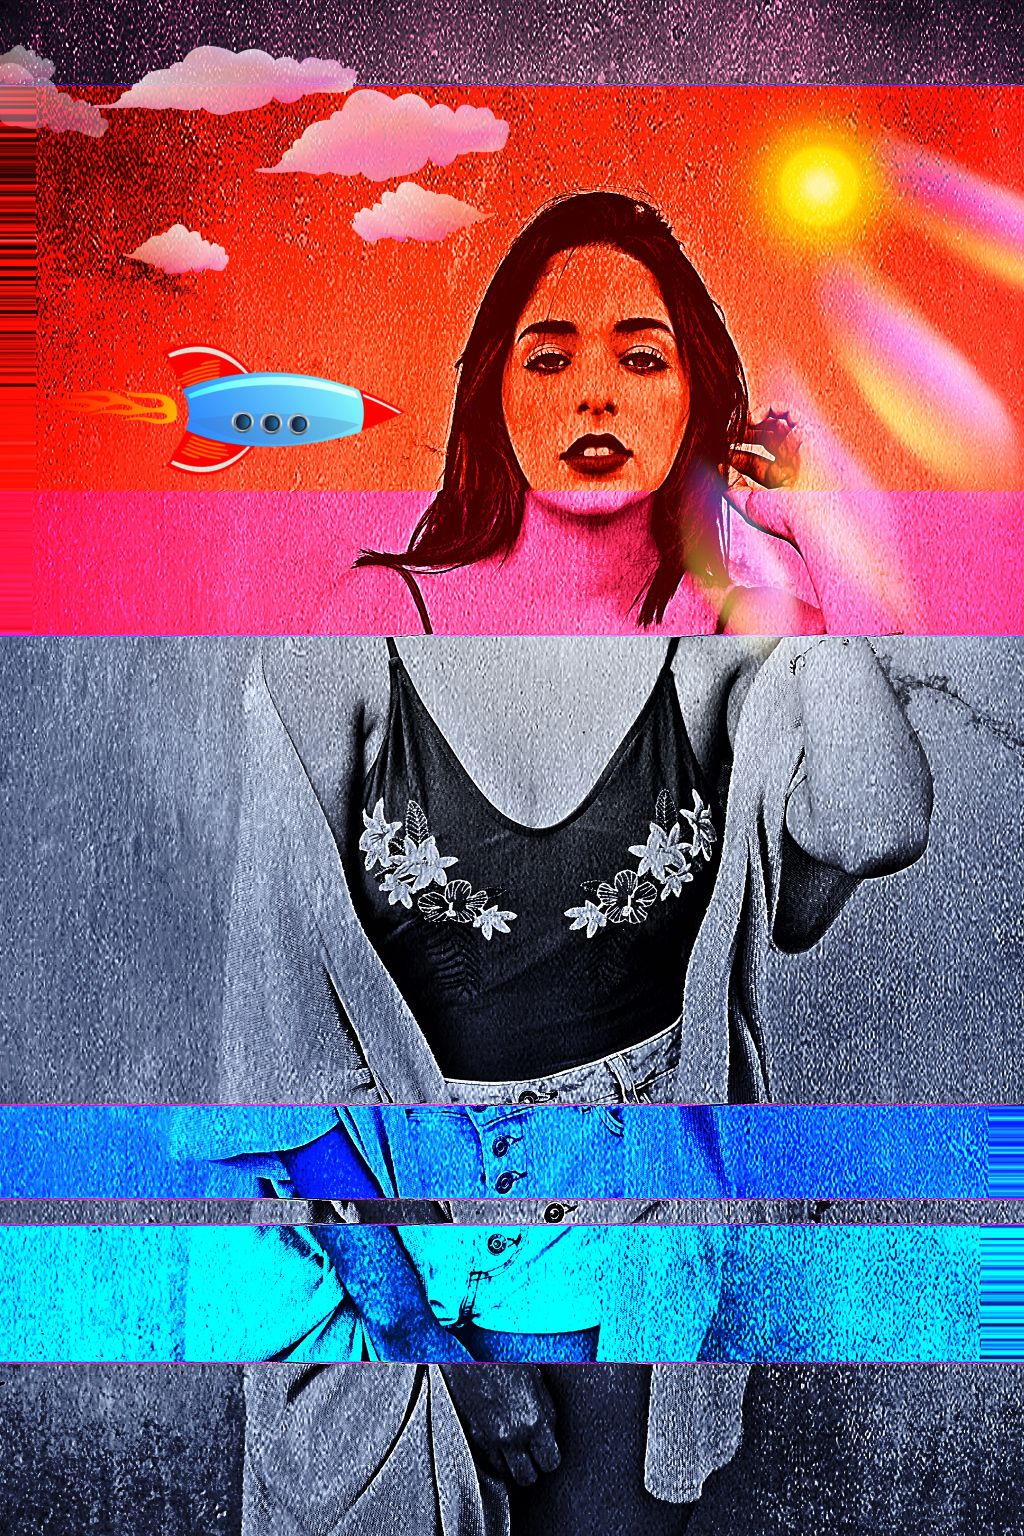 #freetoedit #myedit #artstyle #creative #colorful #picsart #remixit #remixed